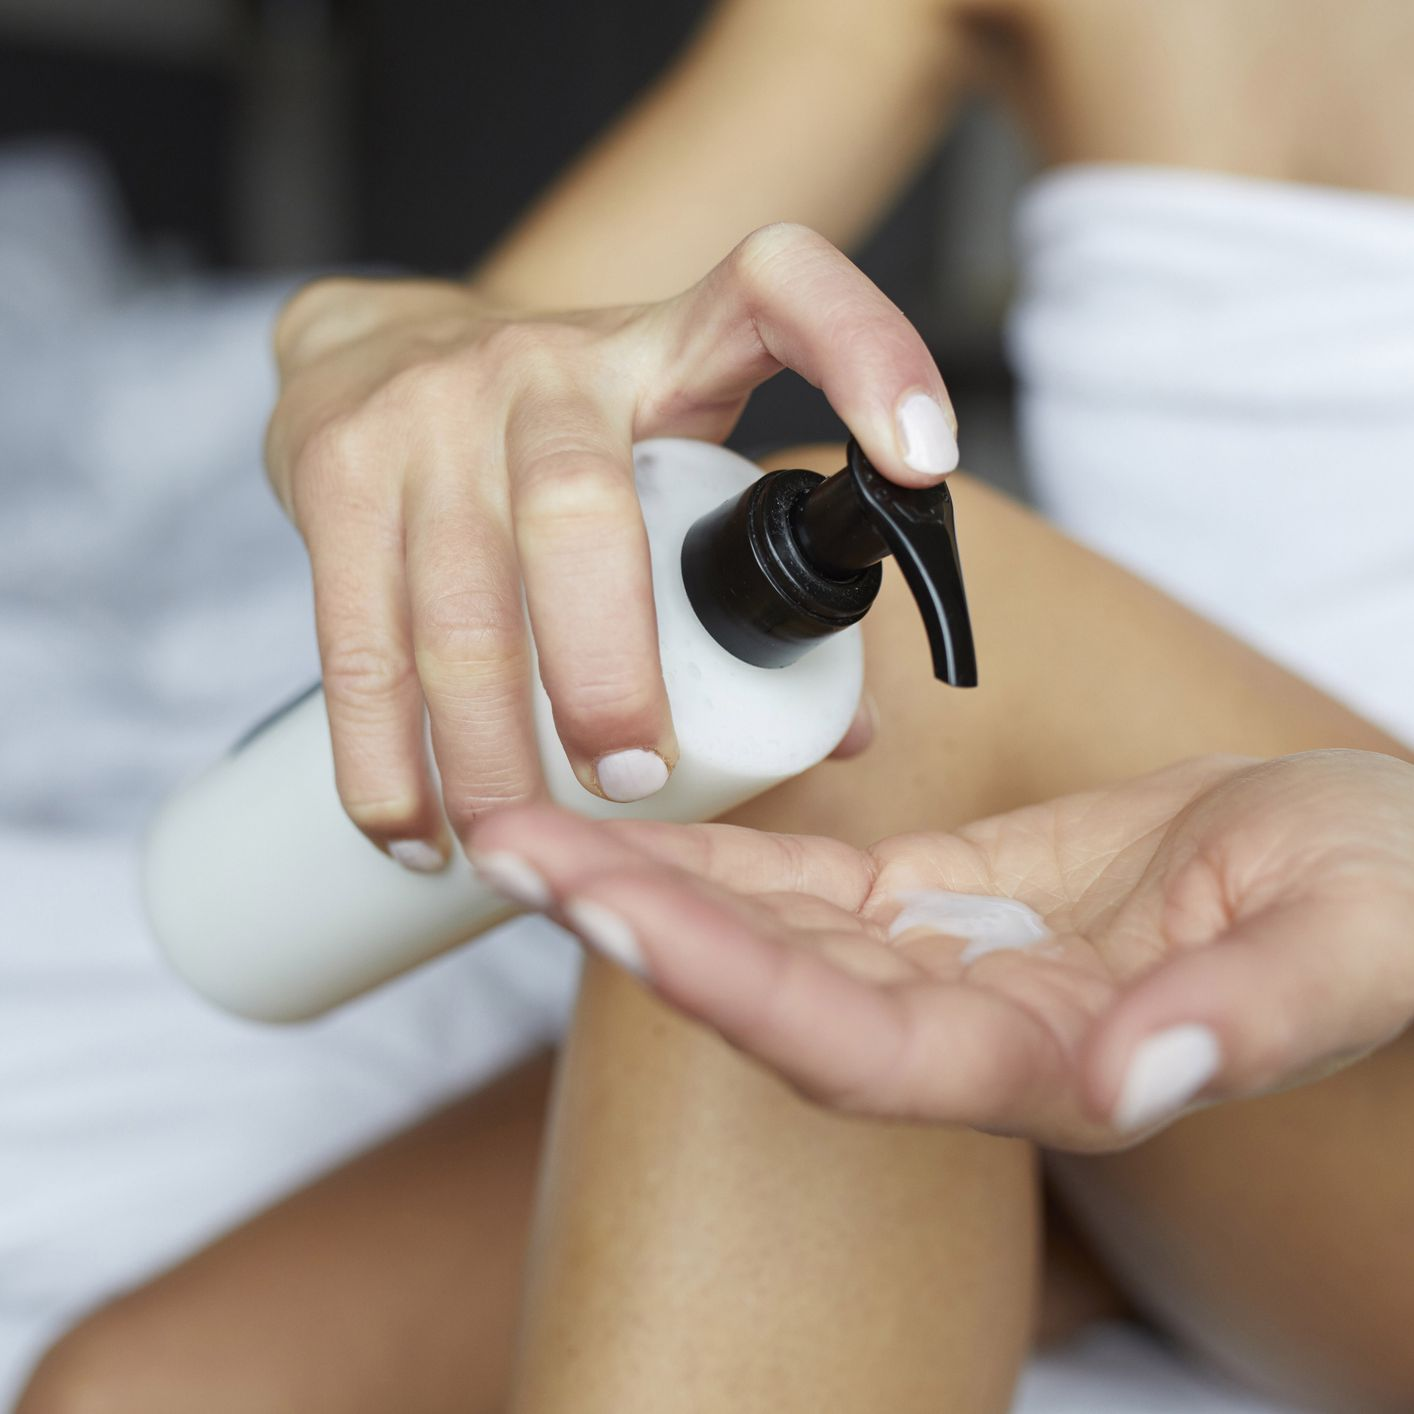 Best Moisturizers for Scaly Skin and Eczema